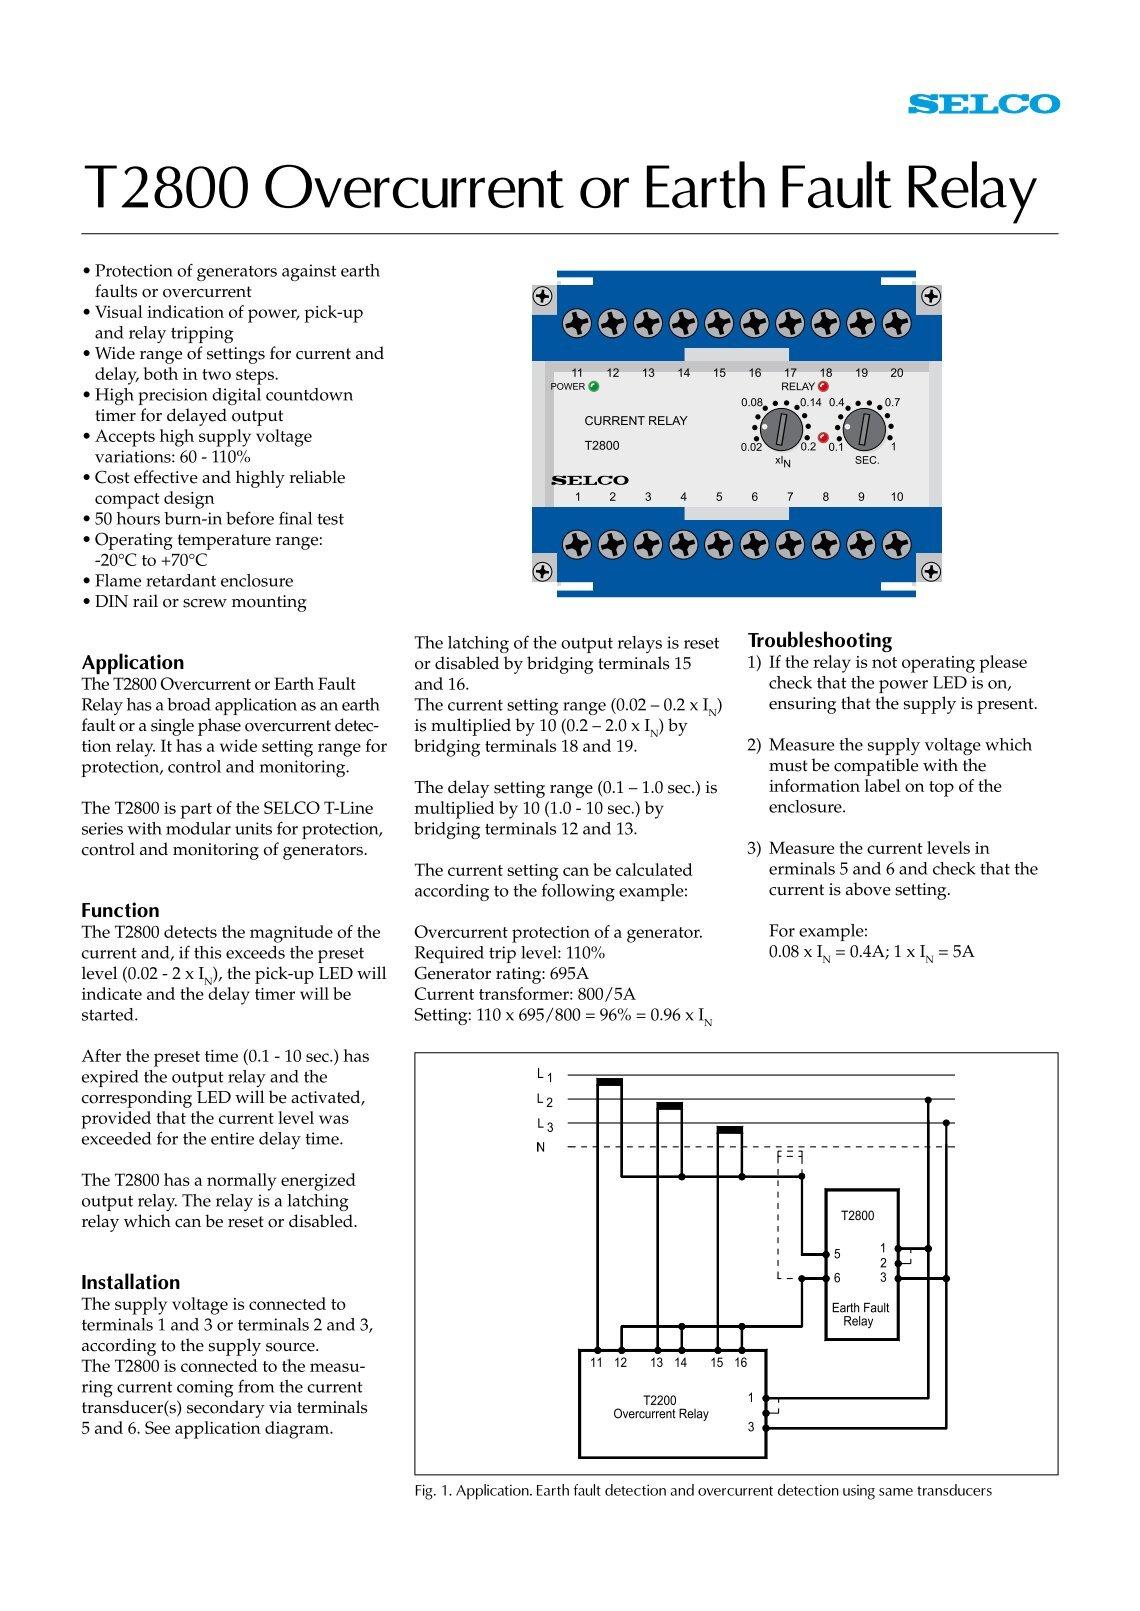 medium resolution of 580k backhoe parts wiring diagram massey ferguson wiring schematic case 570lxt fuel system